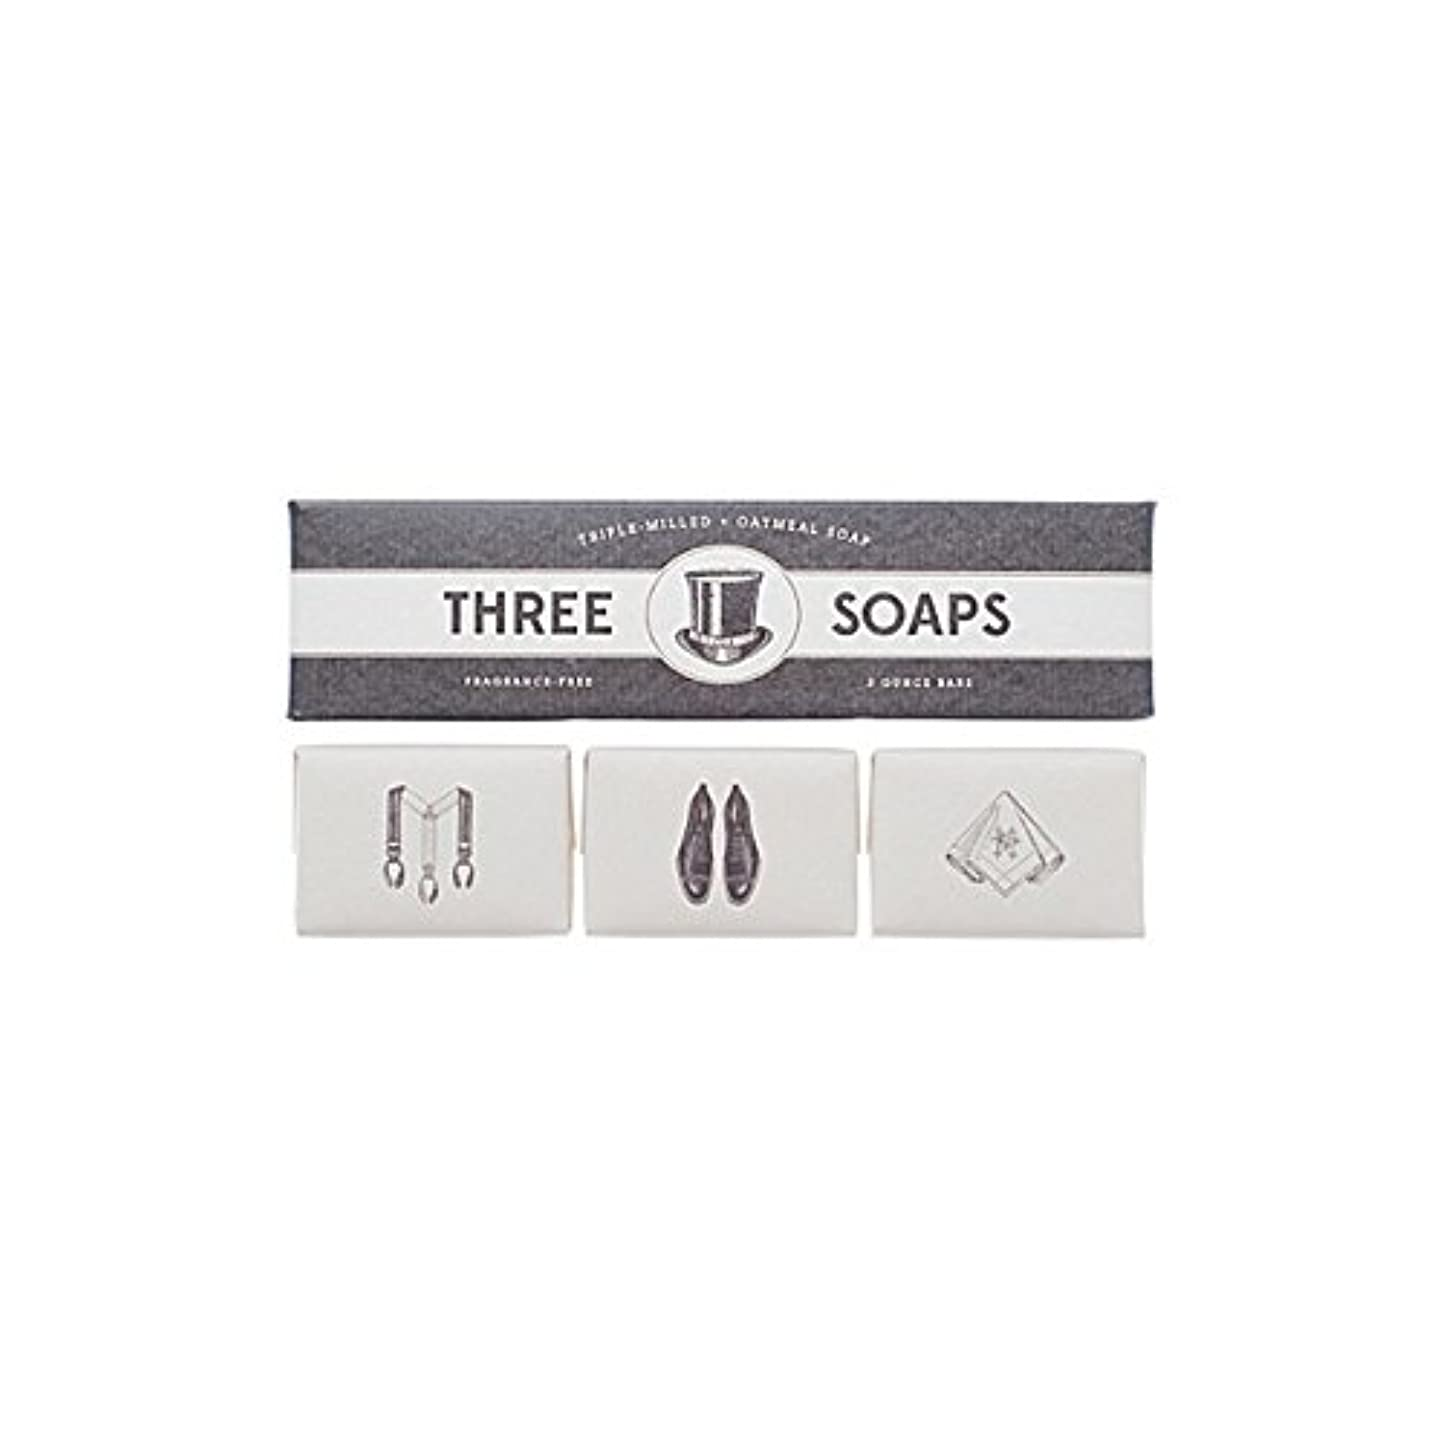 Izola Trio Of Soaps (Pack of 6) - 石鹸のイゾラトリオ x6 [並行輸入品]